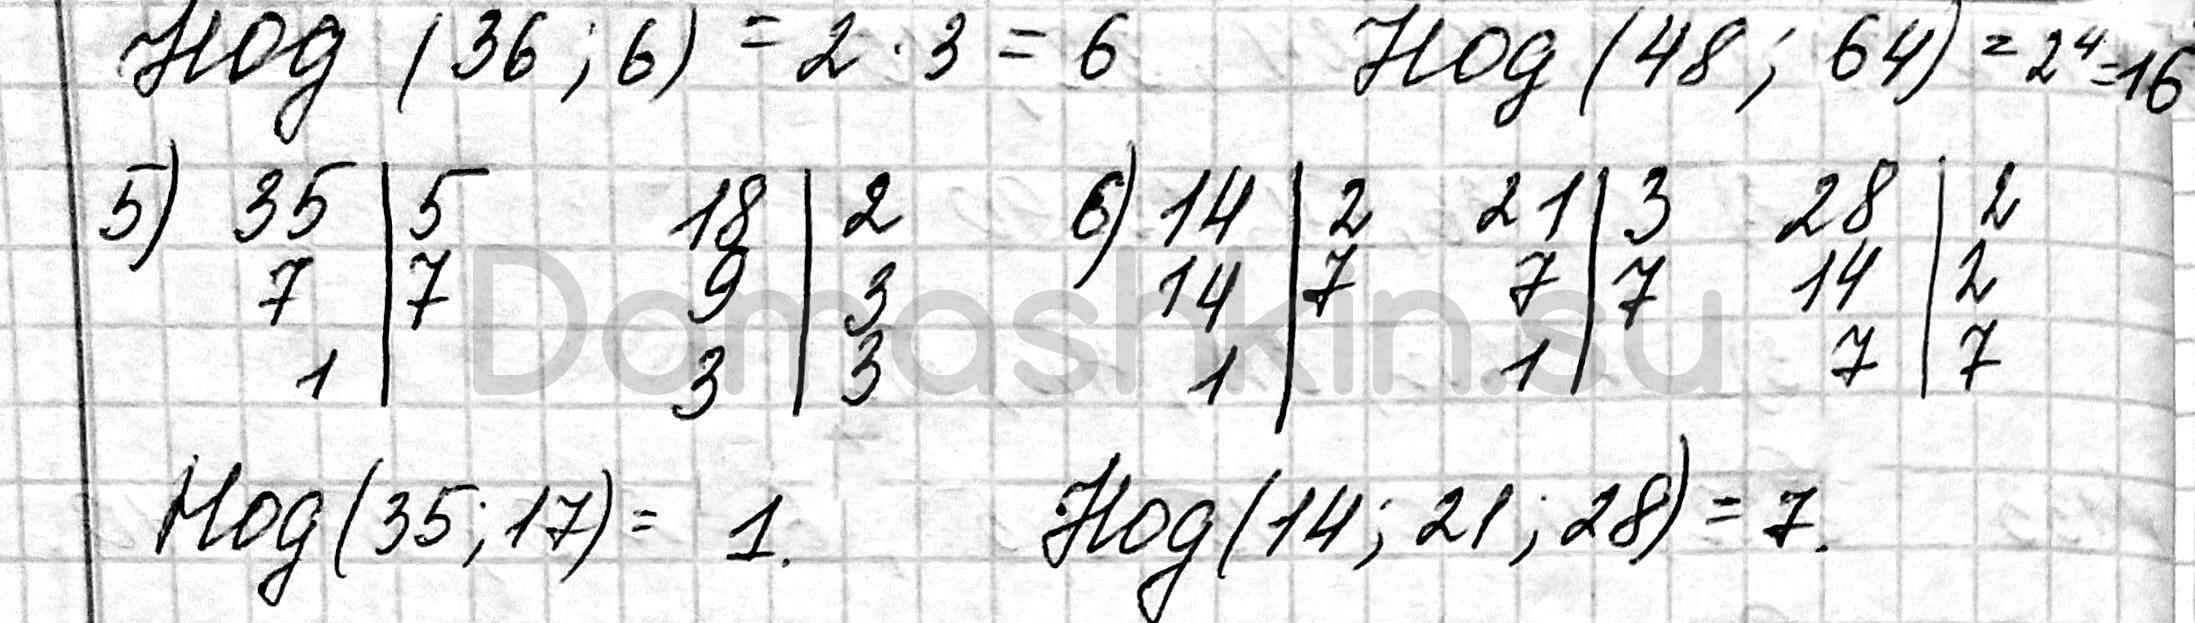 Математика 6 класс учебник Мерзляк номер 38 решение